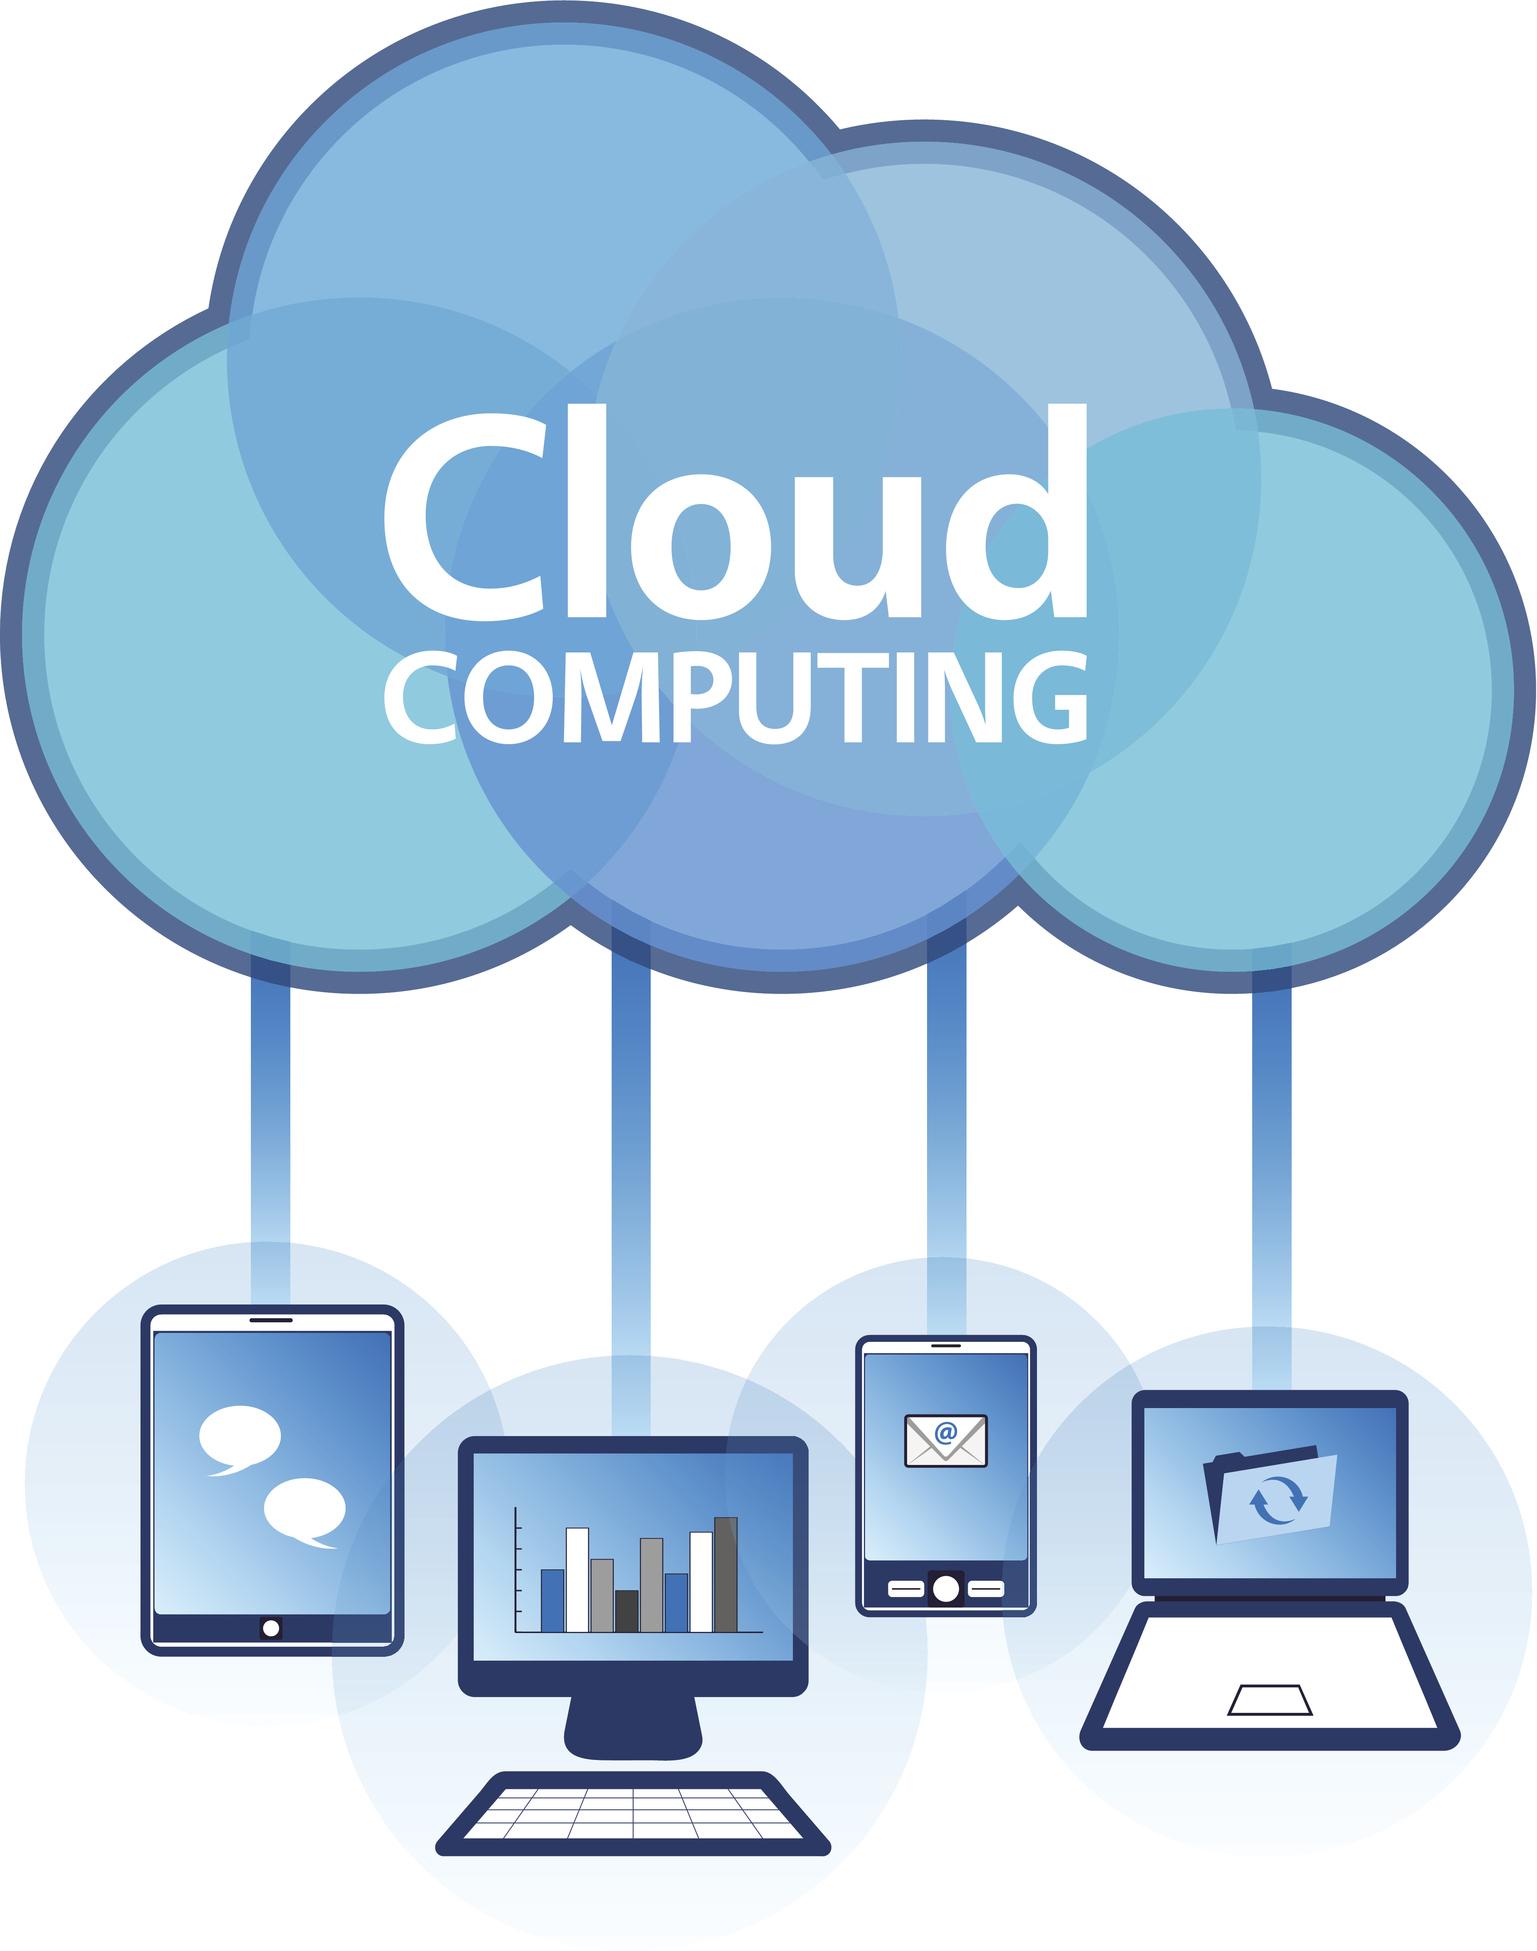 accelercomm 5G will empower cloud computing